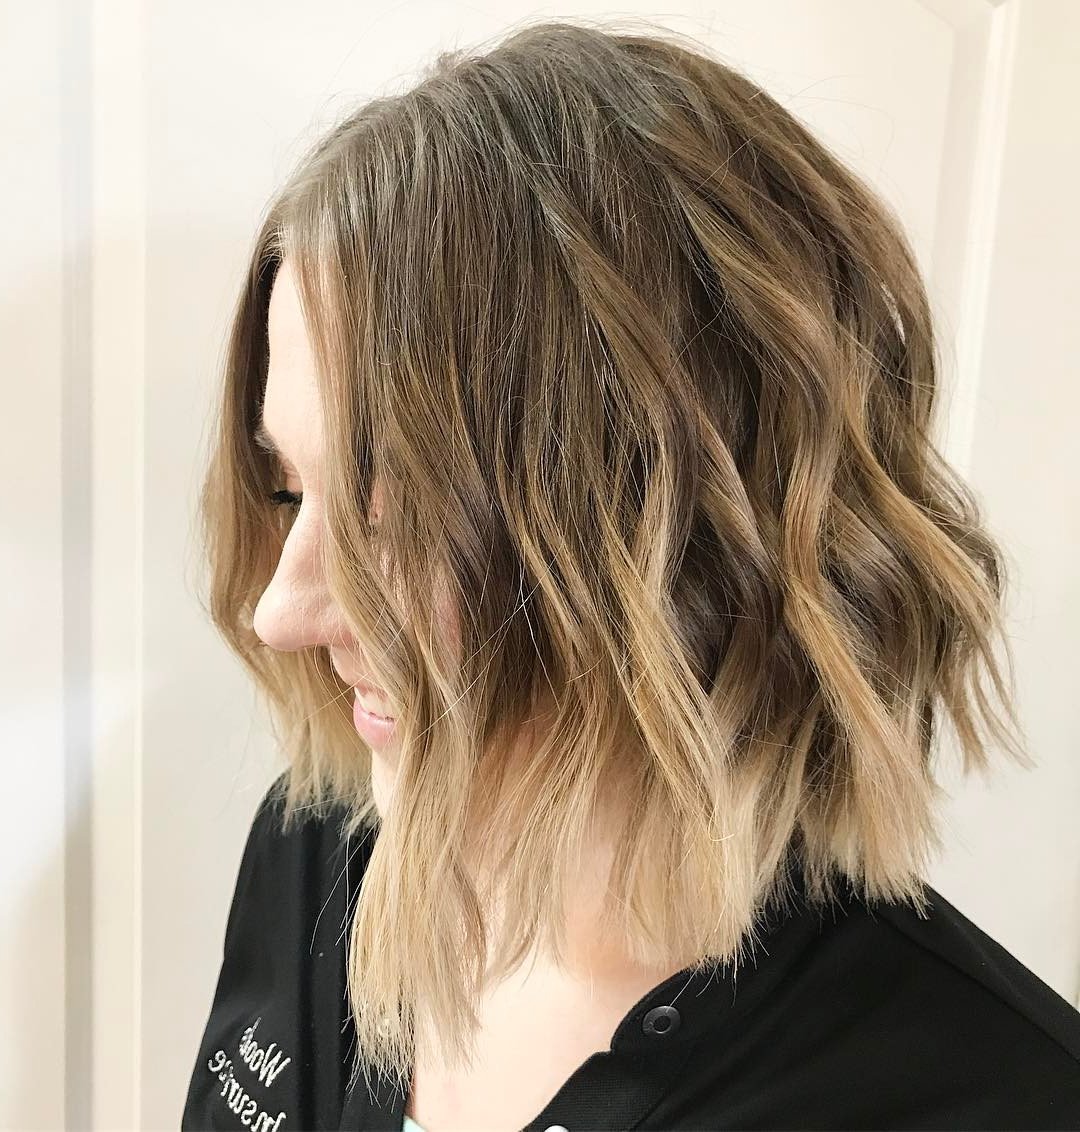 10 Beautiful Medium Bob Haircuts &edgy Looks: Shoulder Length Within Nape Length Wavy Ash Brown Bob Hairstyles (View 1 of 25)